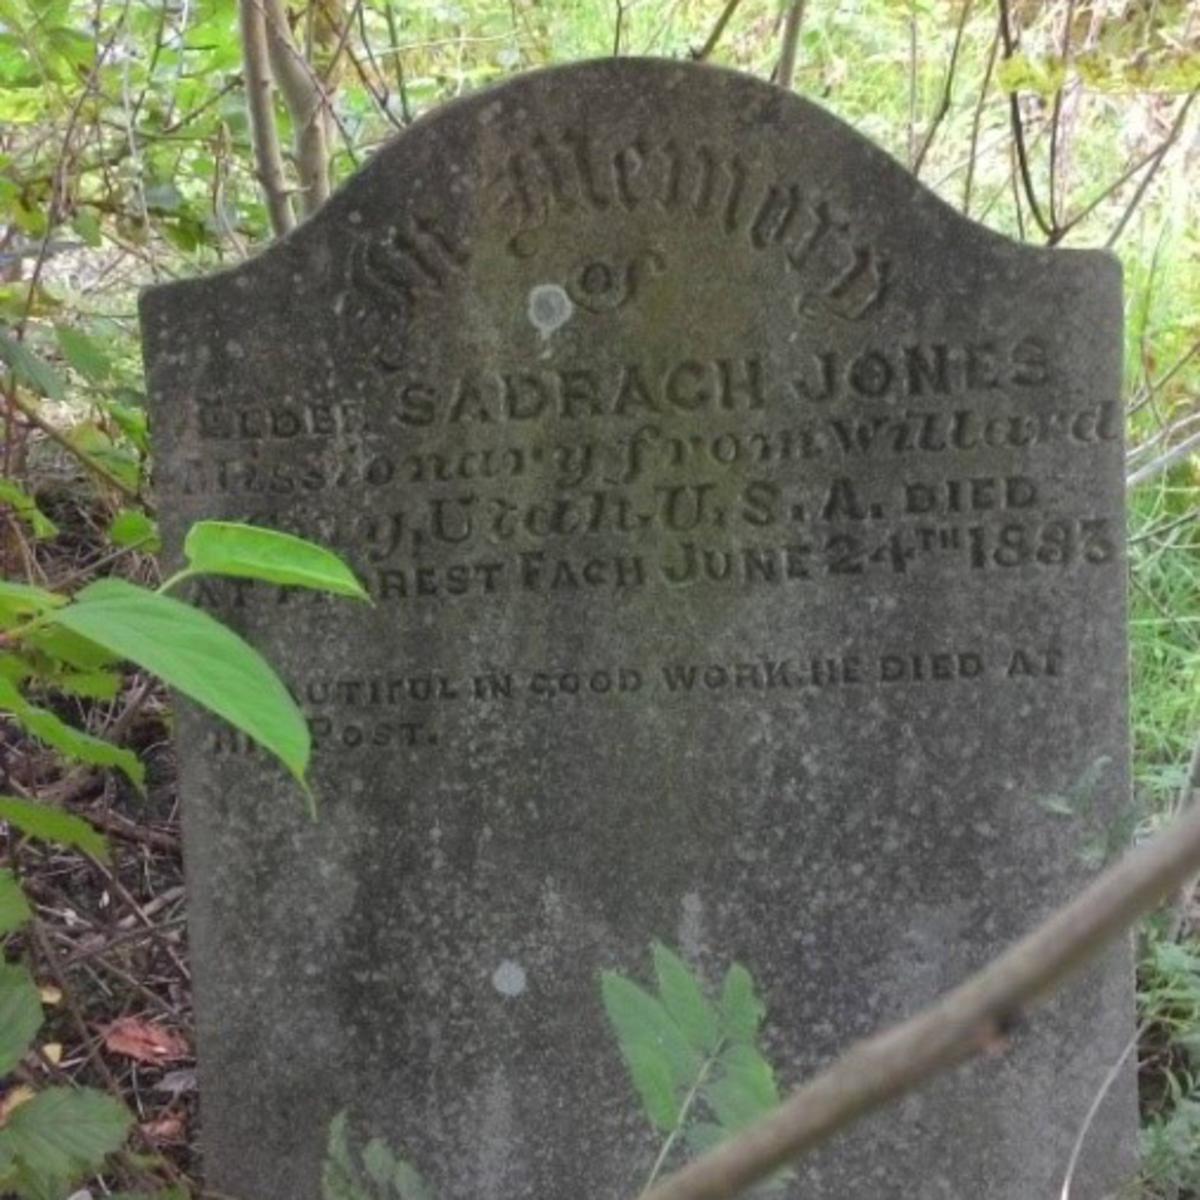 Stone of Shadrach Jones